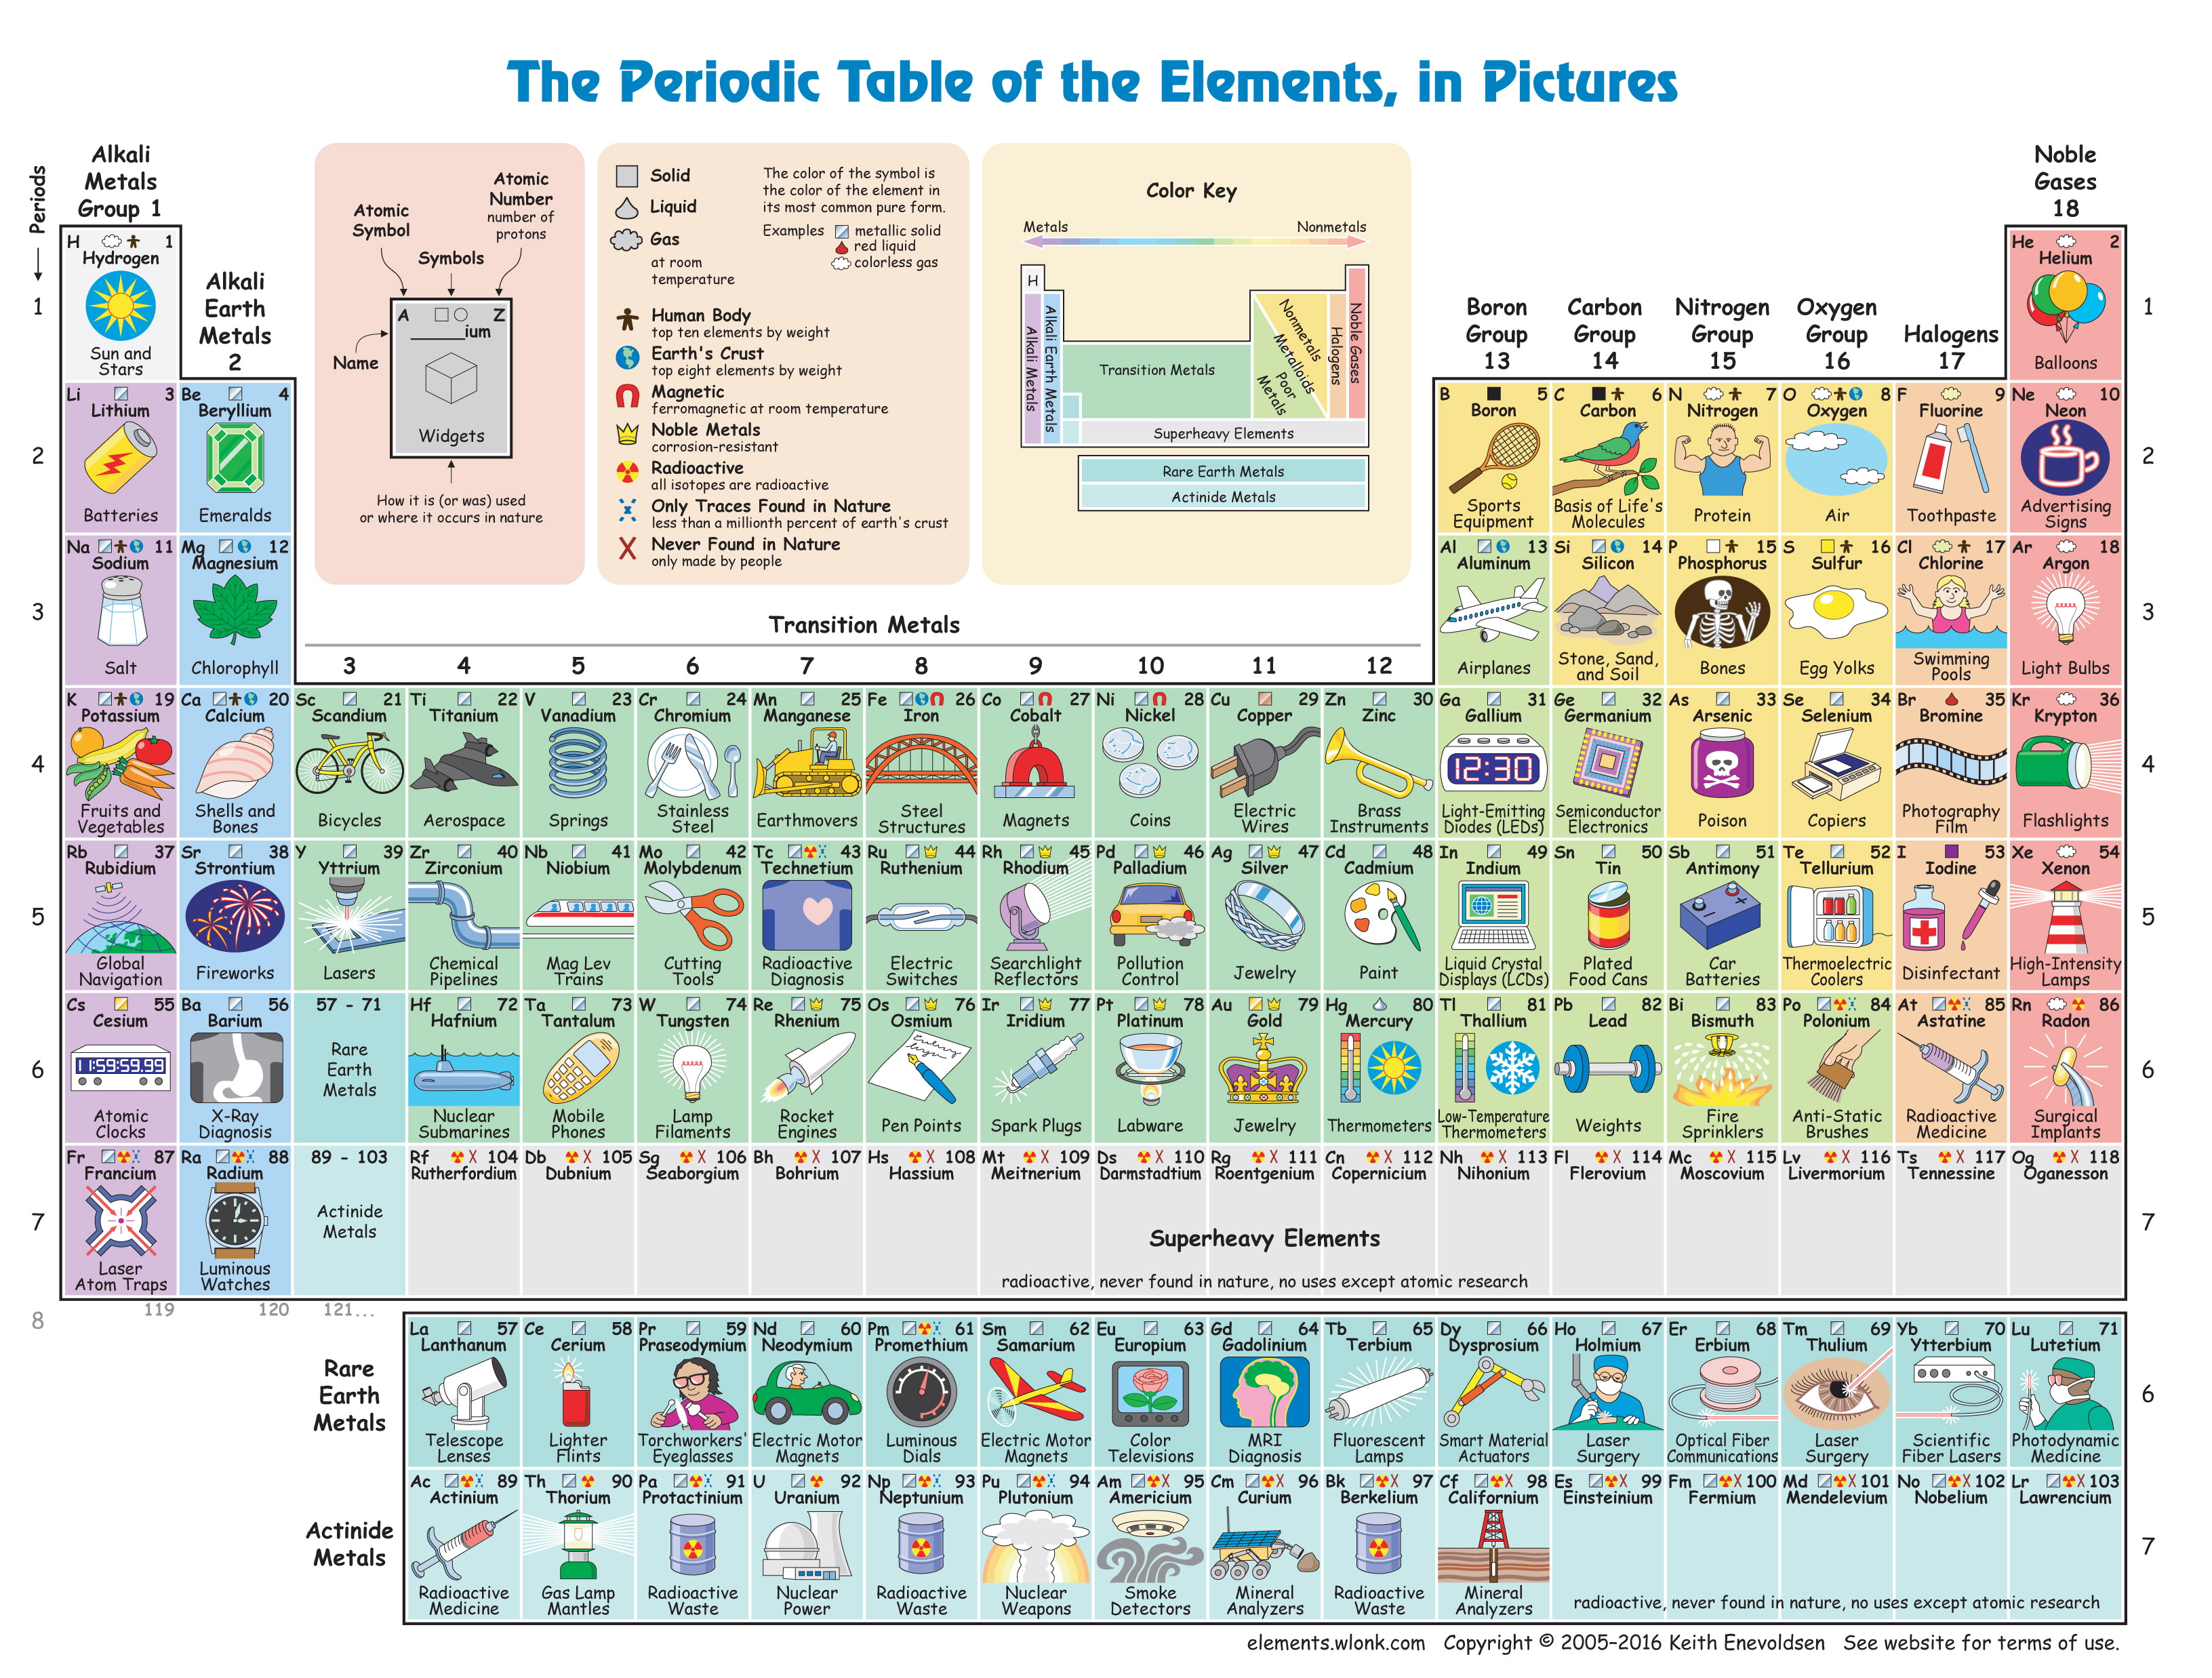 Elements_Pics_11x8-1.jpg